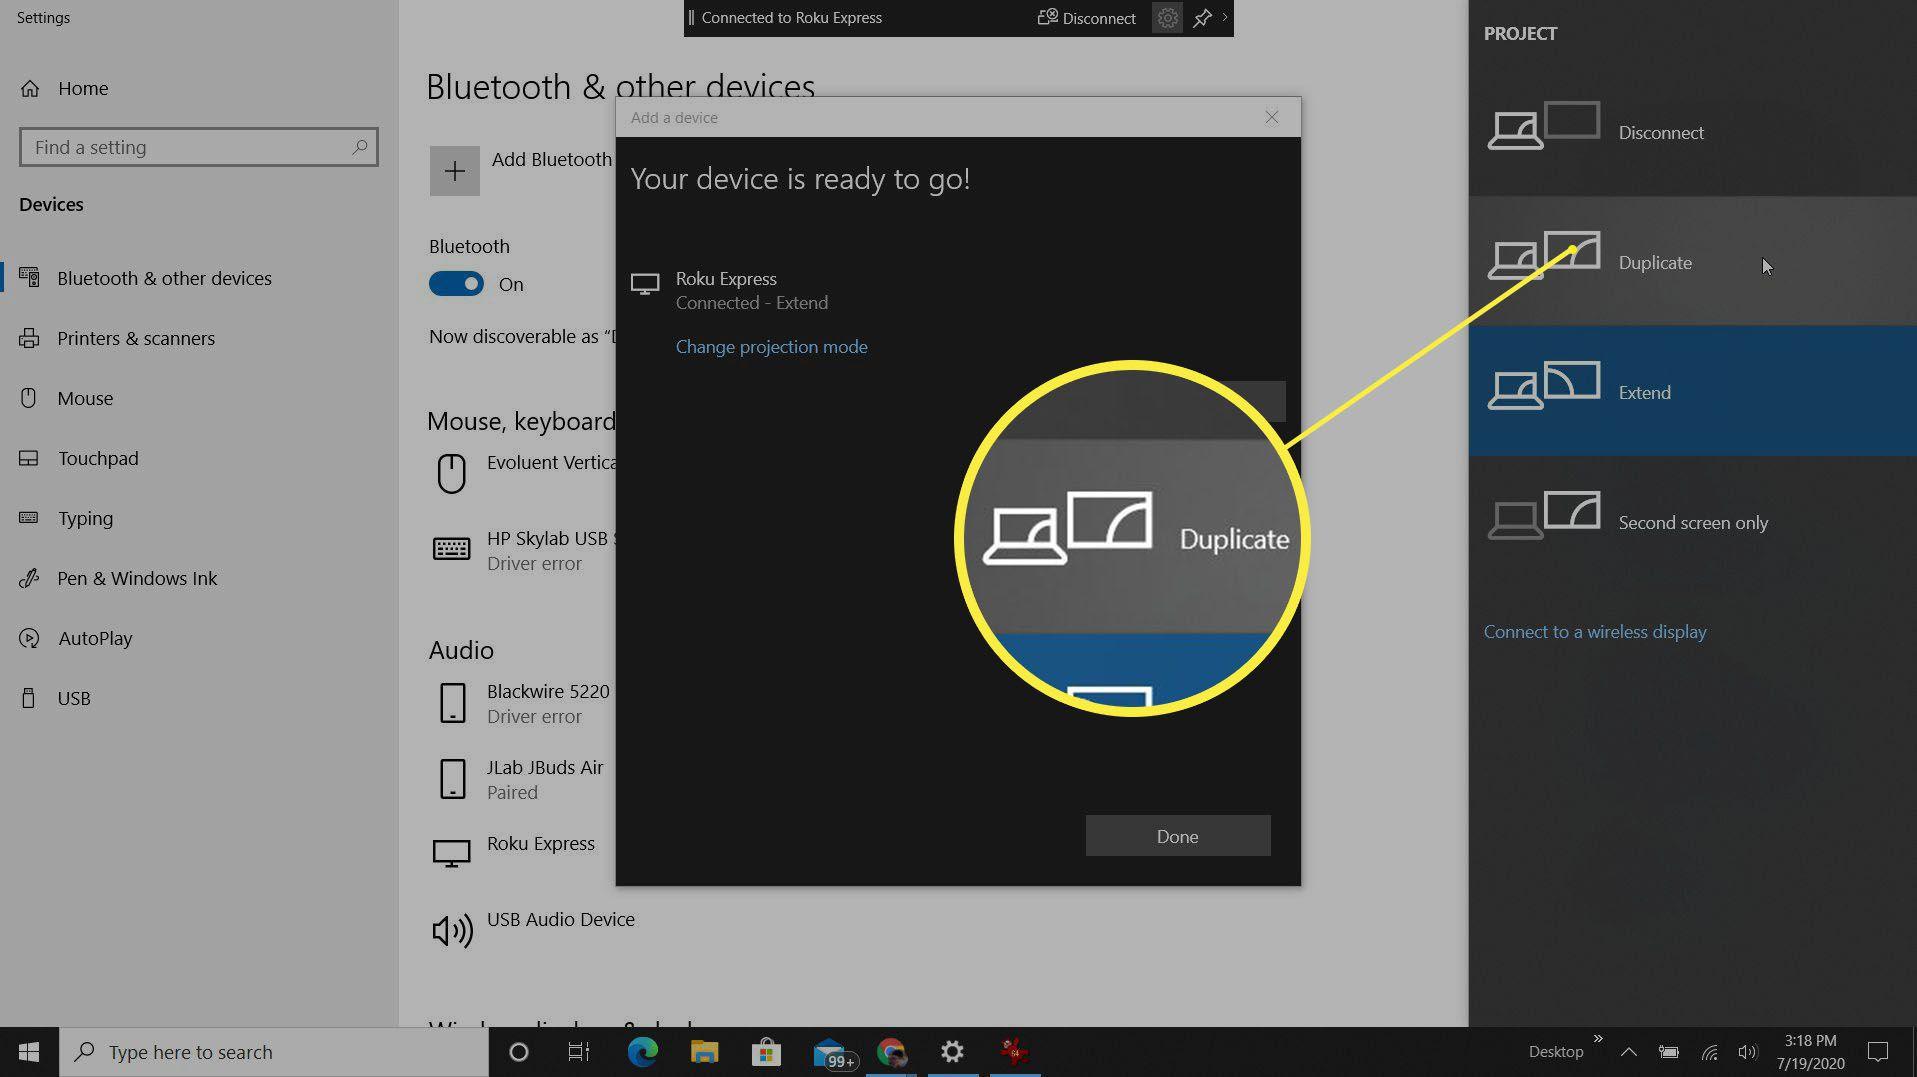 Screenshot of change project mode for Roku on Windows 10.